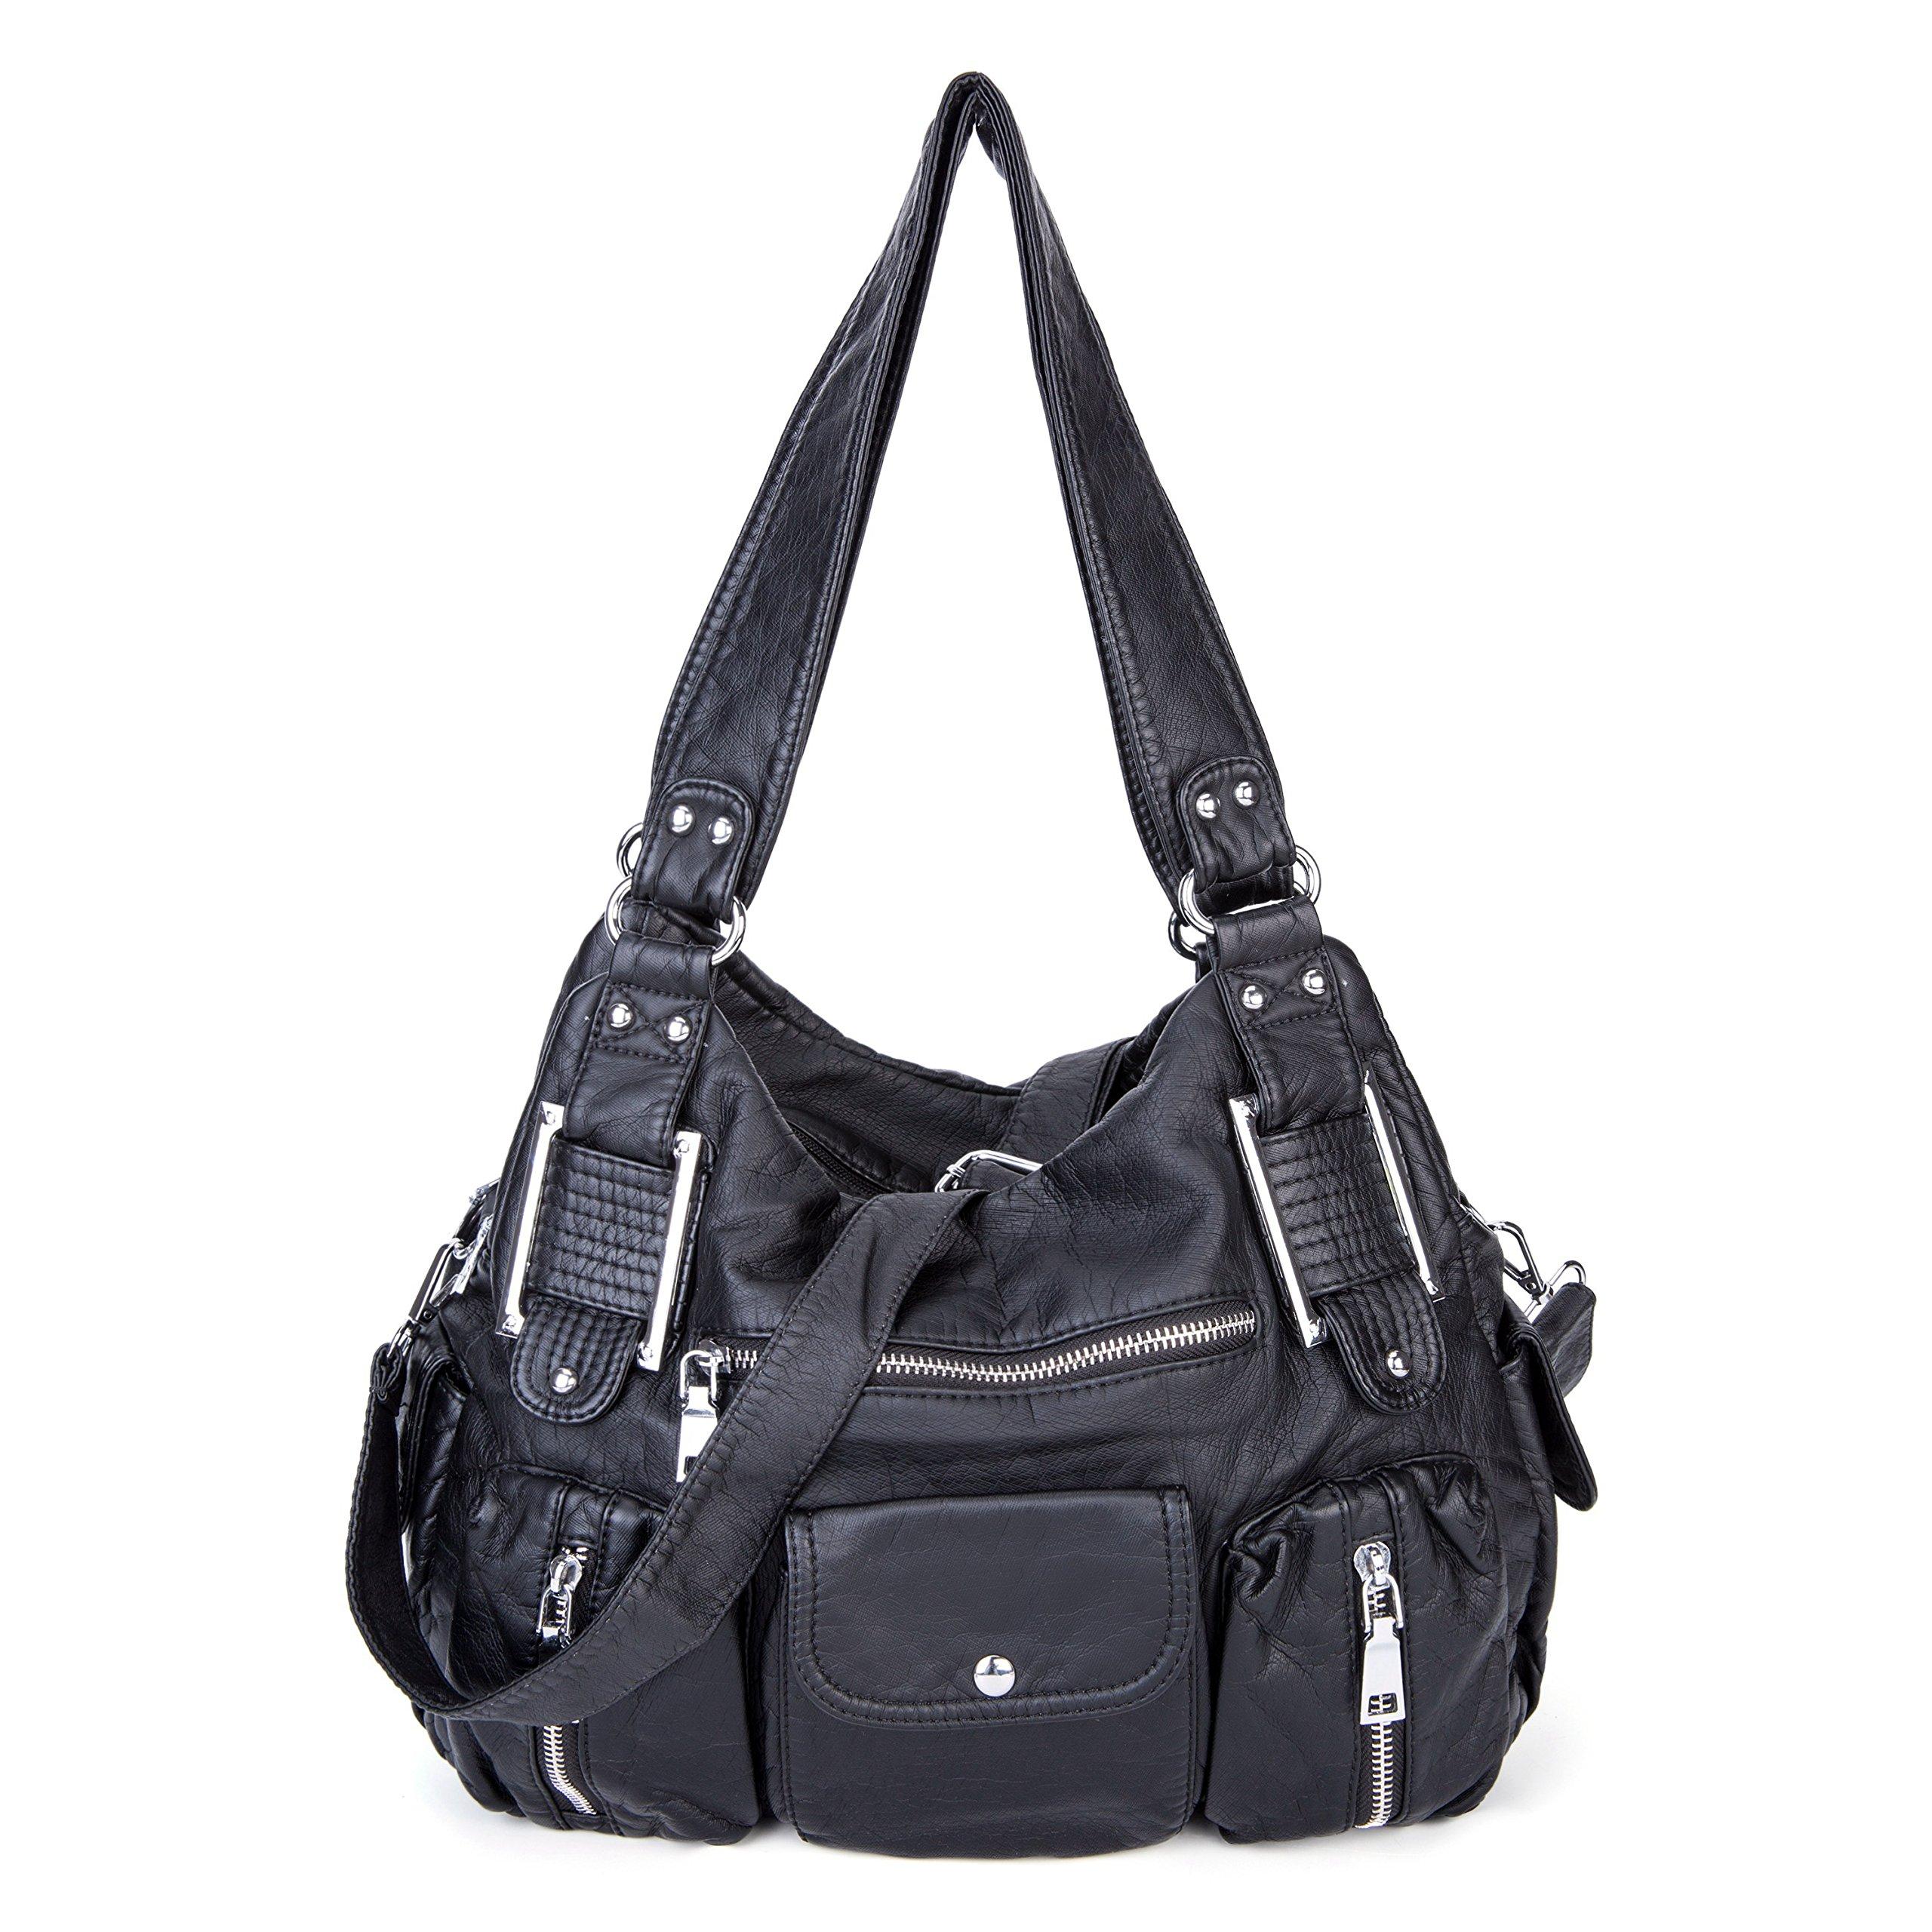 Shoulder Bag Purse Soft Large Capacity Tote Bag Washed PU Leather Cross Body Handbag for Women (Black)